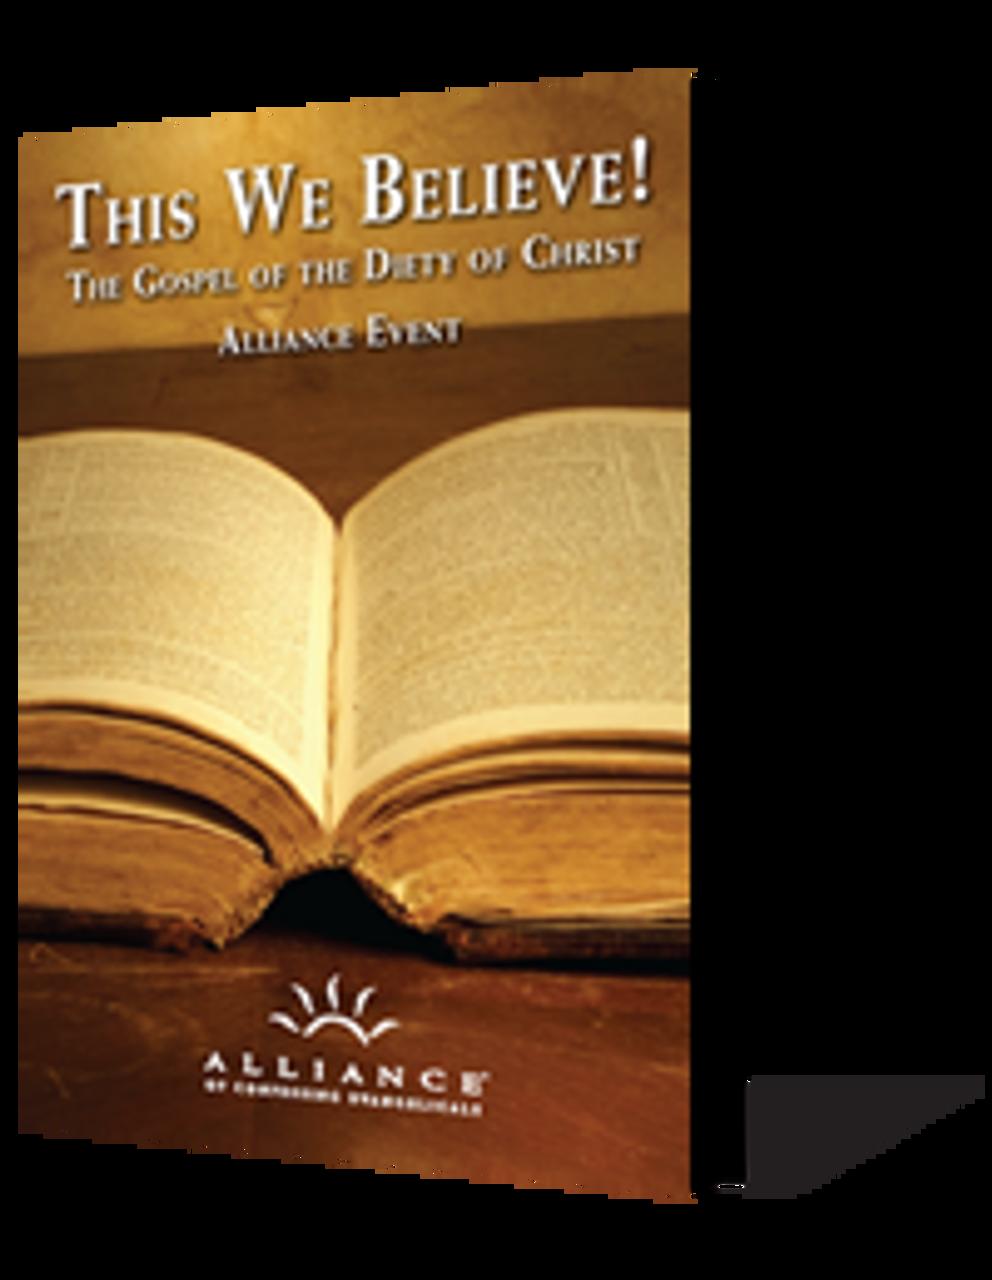 This We Believe (CD Set)